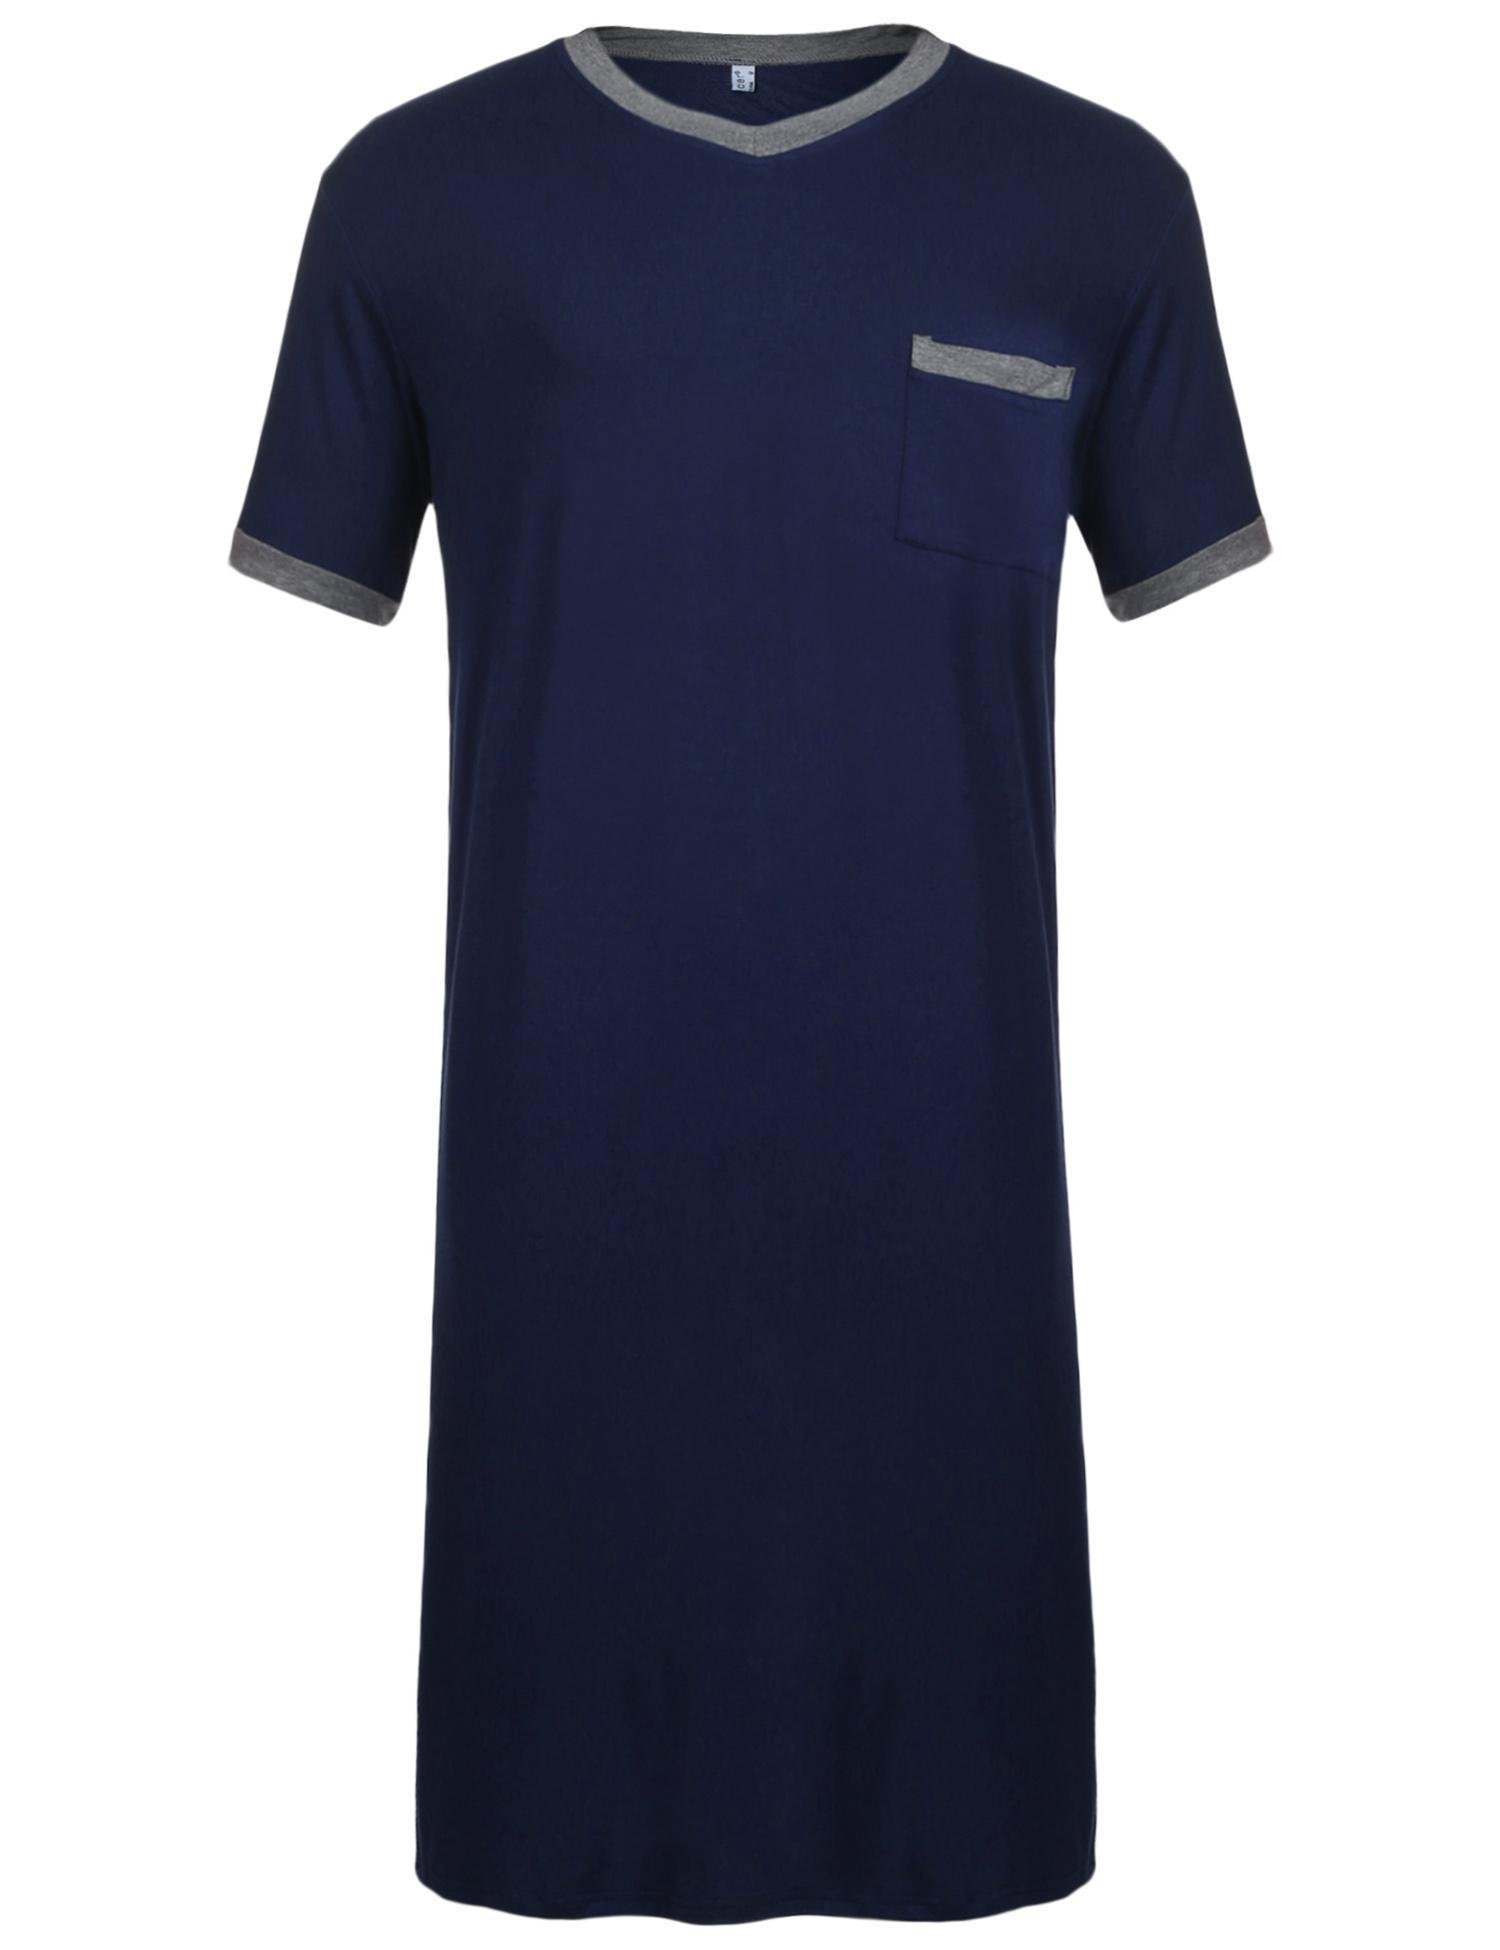 Dicesnow Men's Nightshirts Soft Cotton Big & Tall Short Sleeve Henley Sleep Shirt